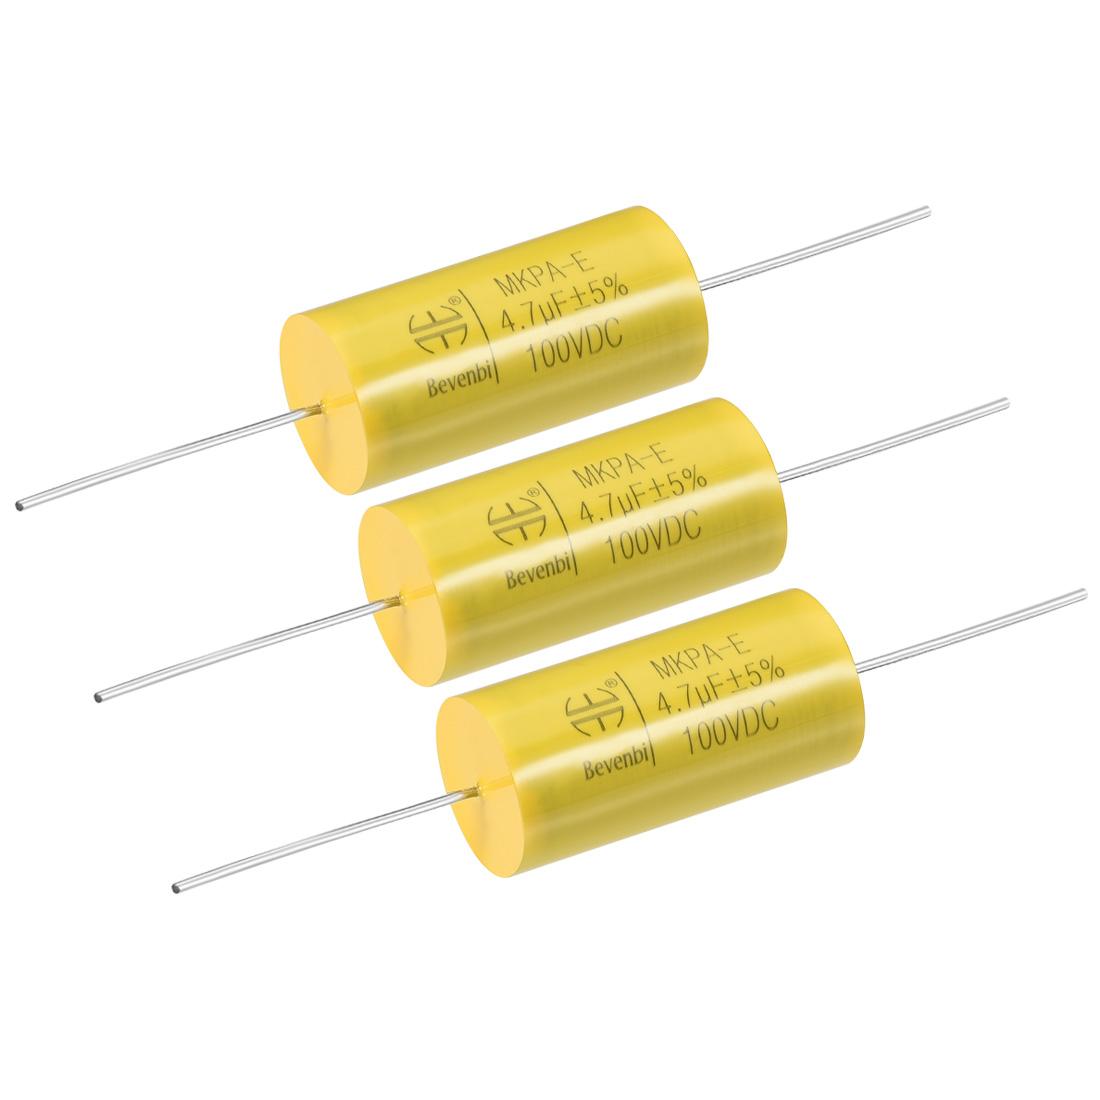 Film Capacitor 100V DC 4.7uF MKPA-E Round Polypropylene Capacitors Yellow 3pcs